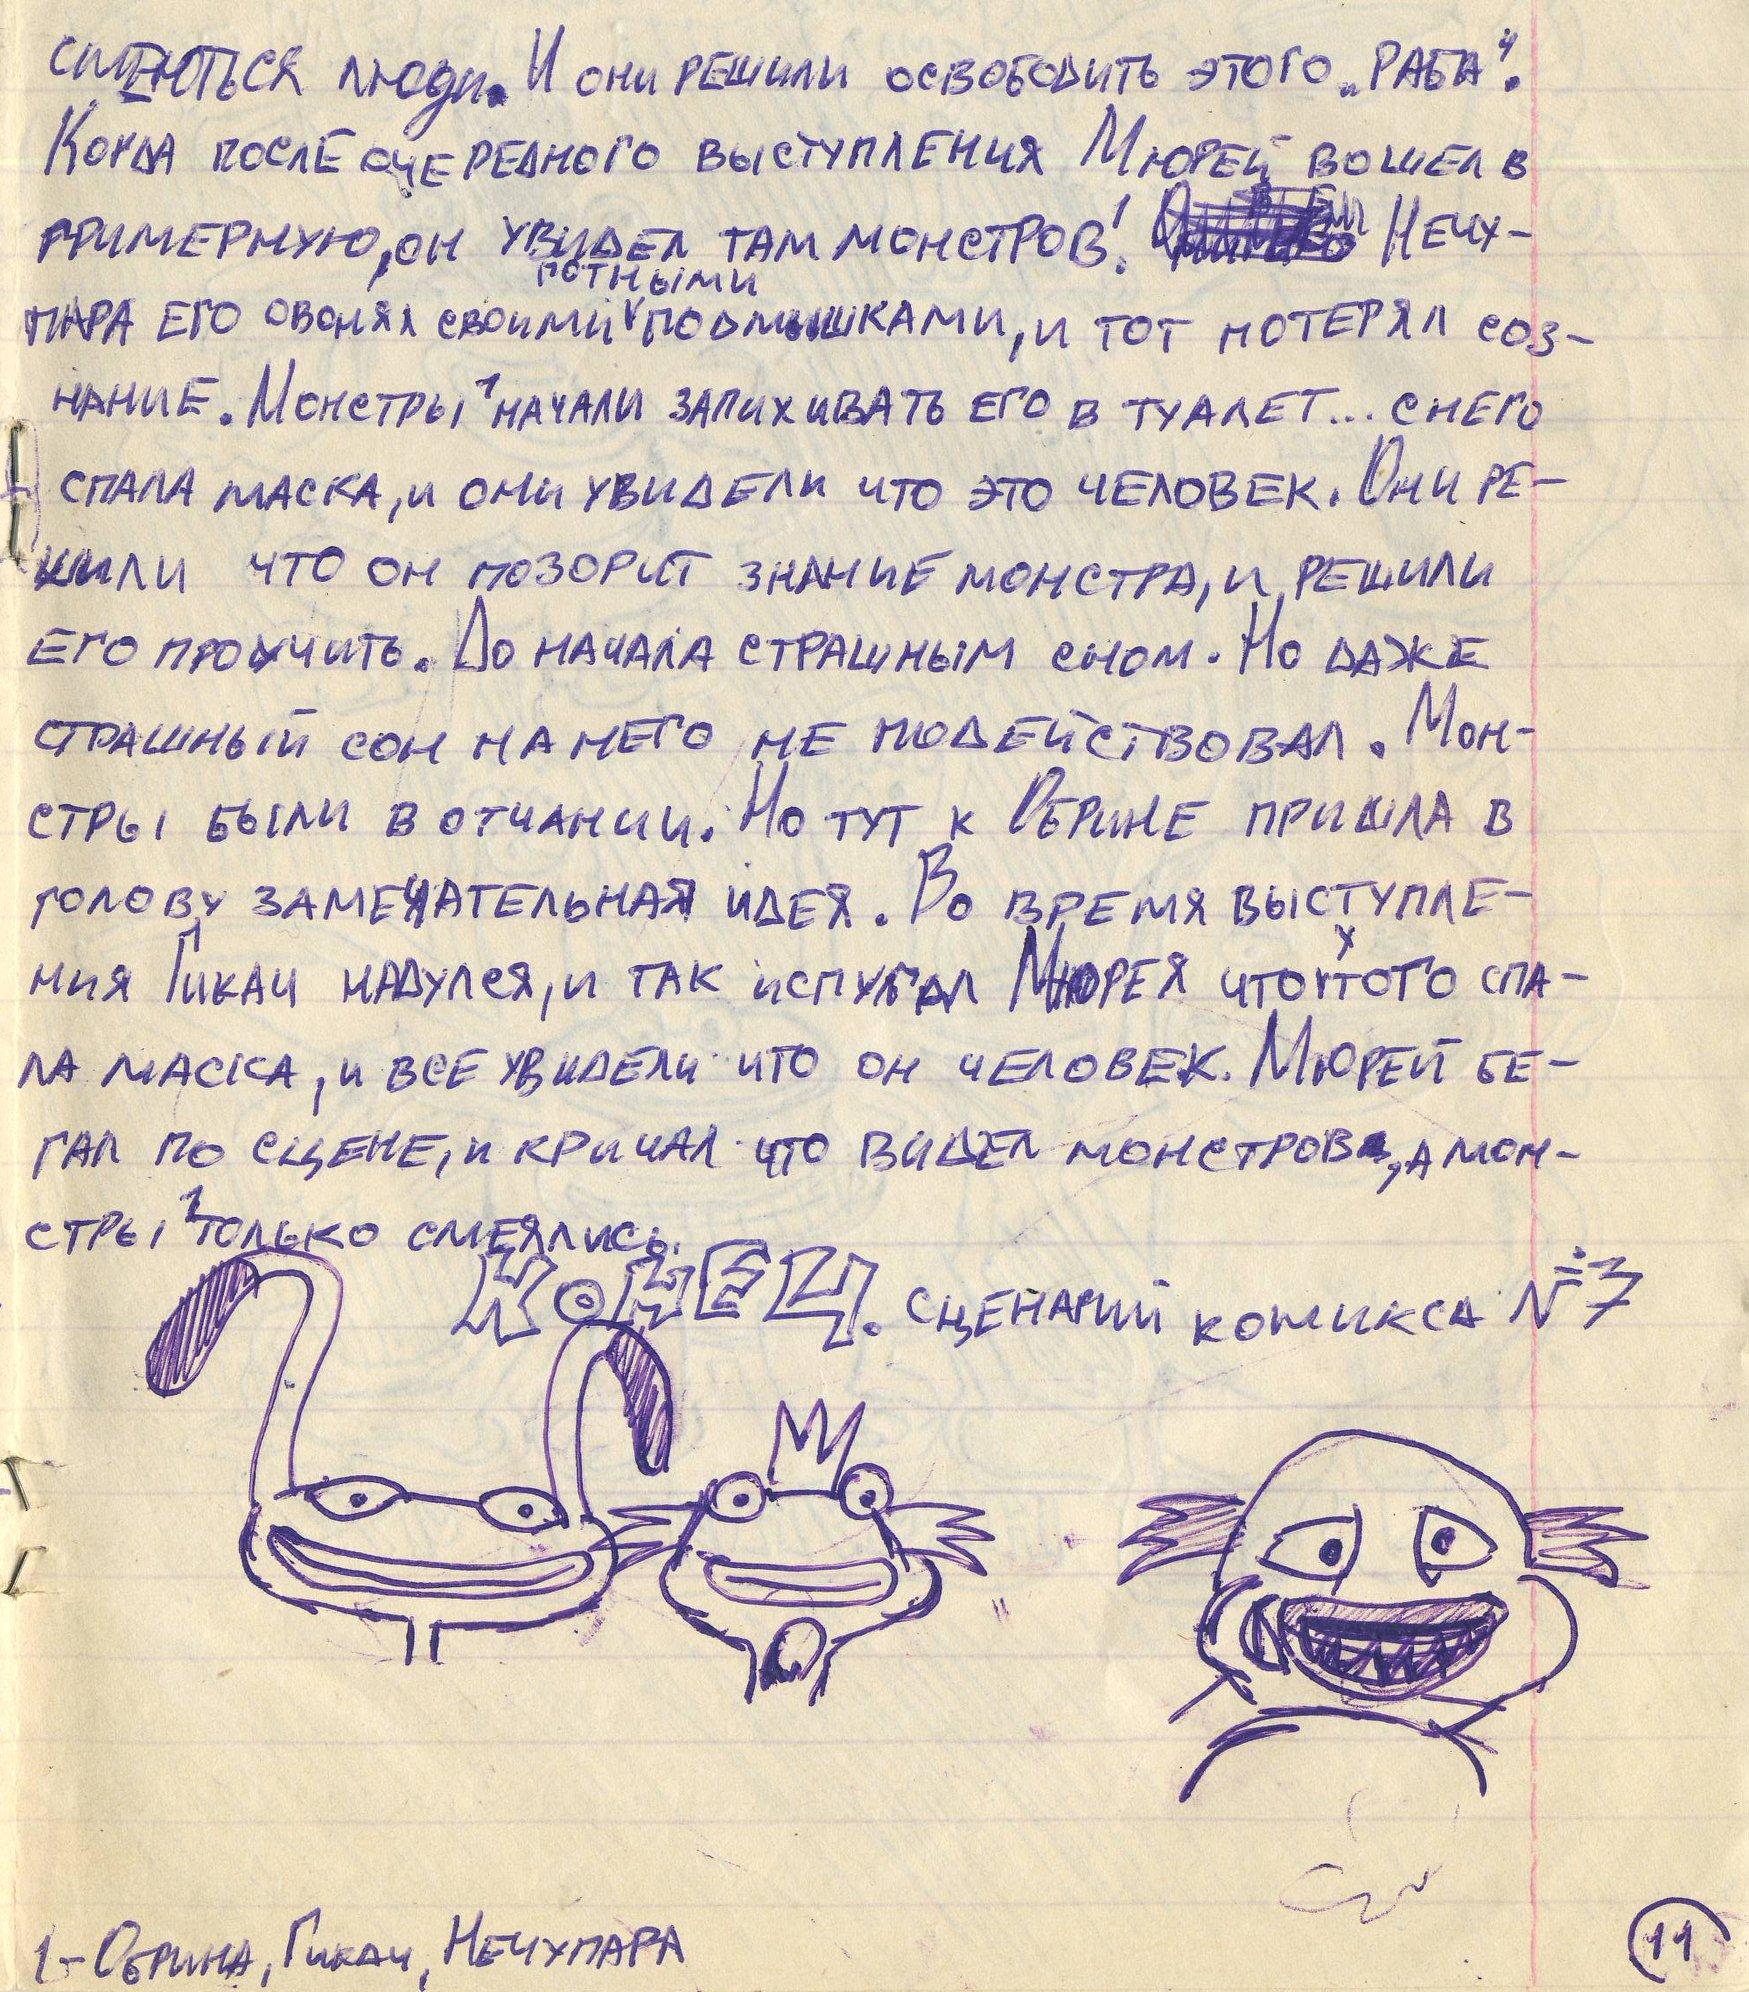 Alexander Chepelev - Monsters